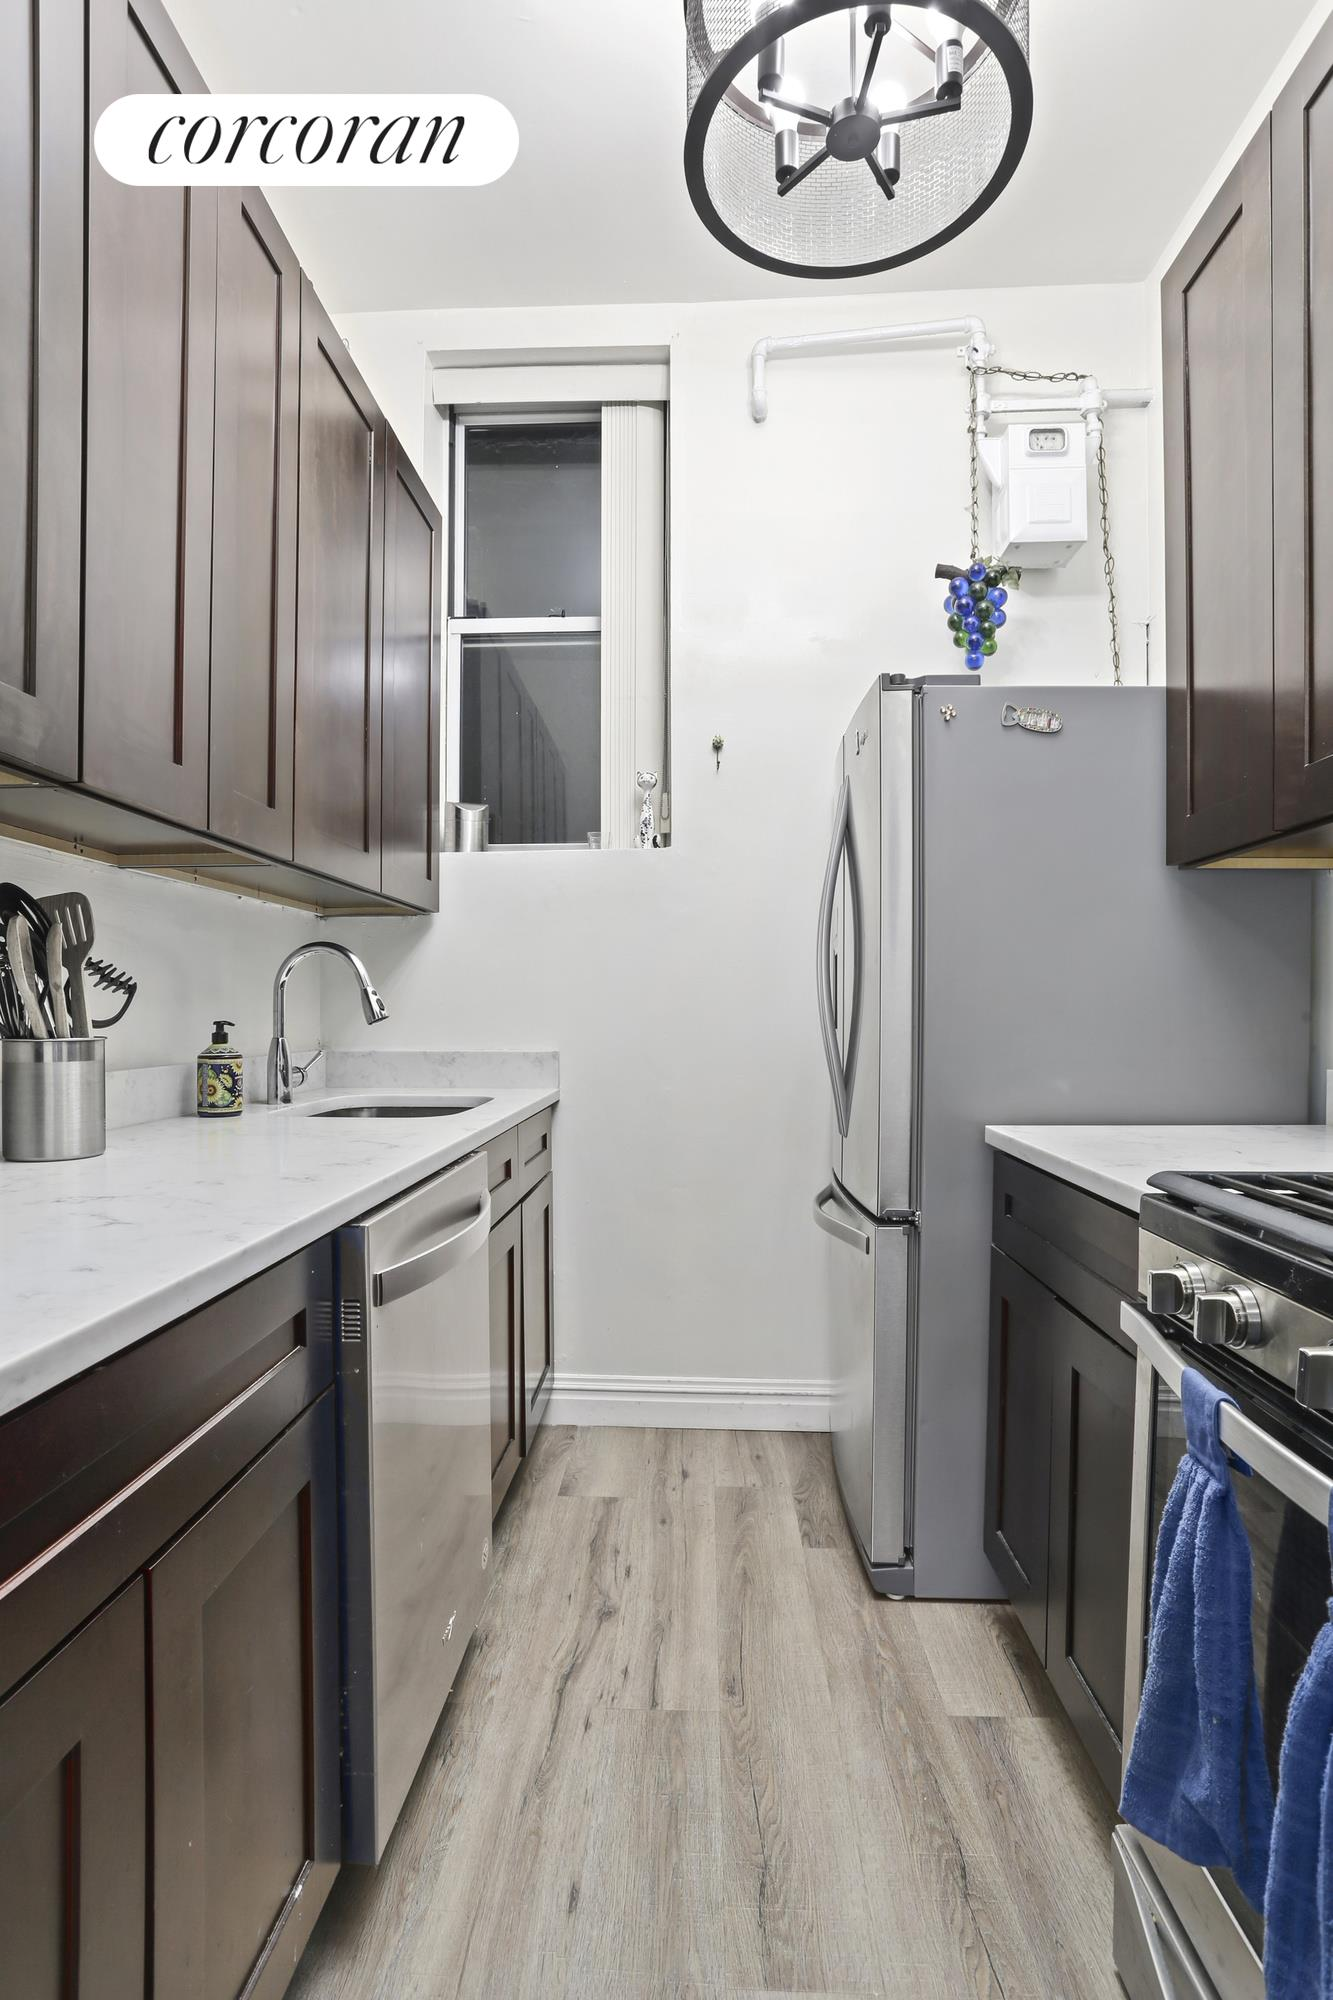 corcoran 169 eighth ave apt 4f chelsea hudson yards rentals